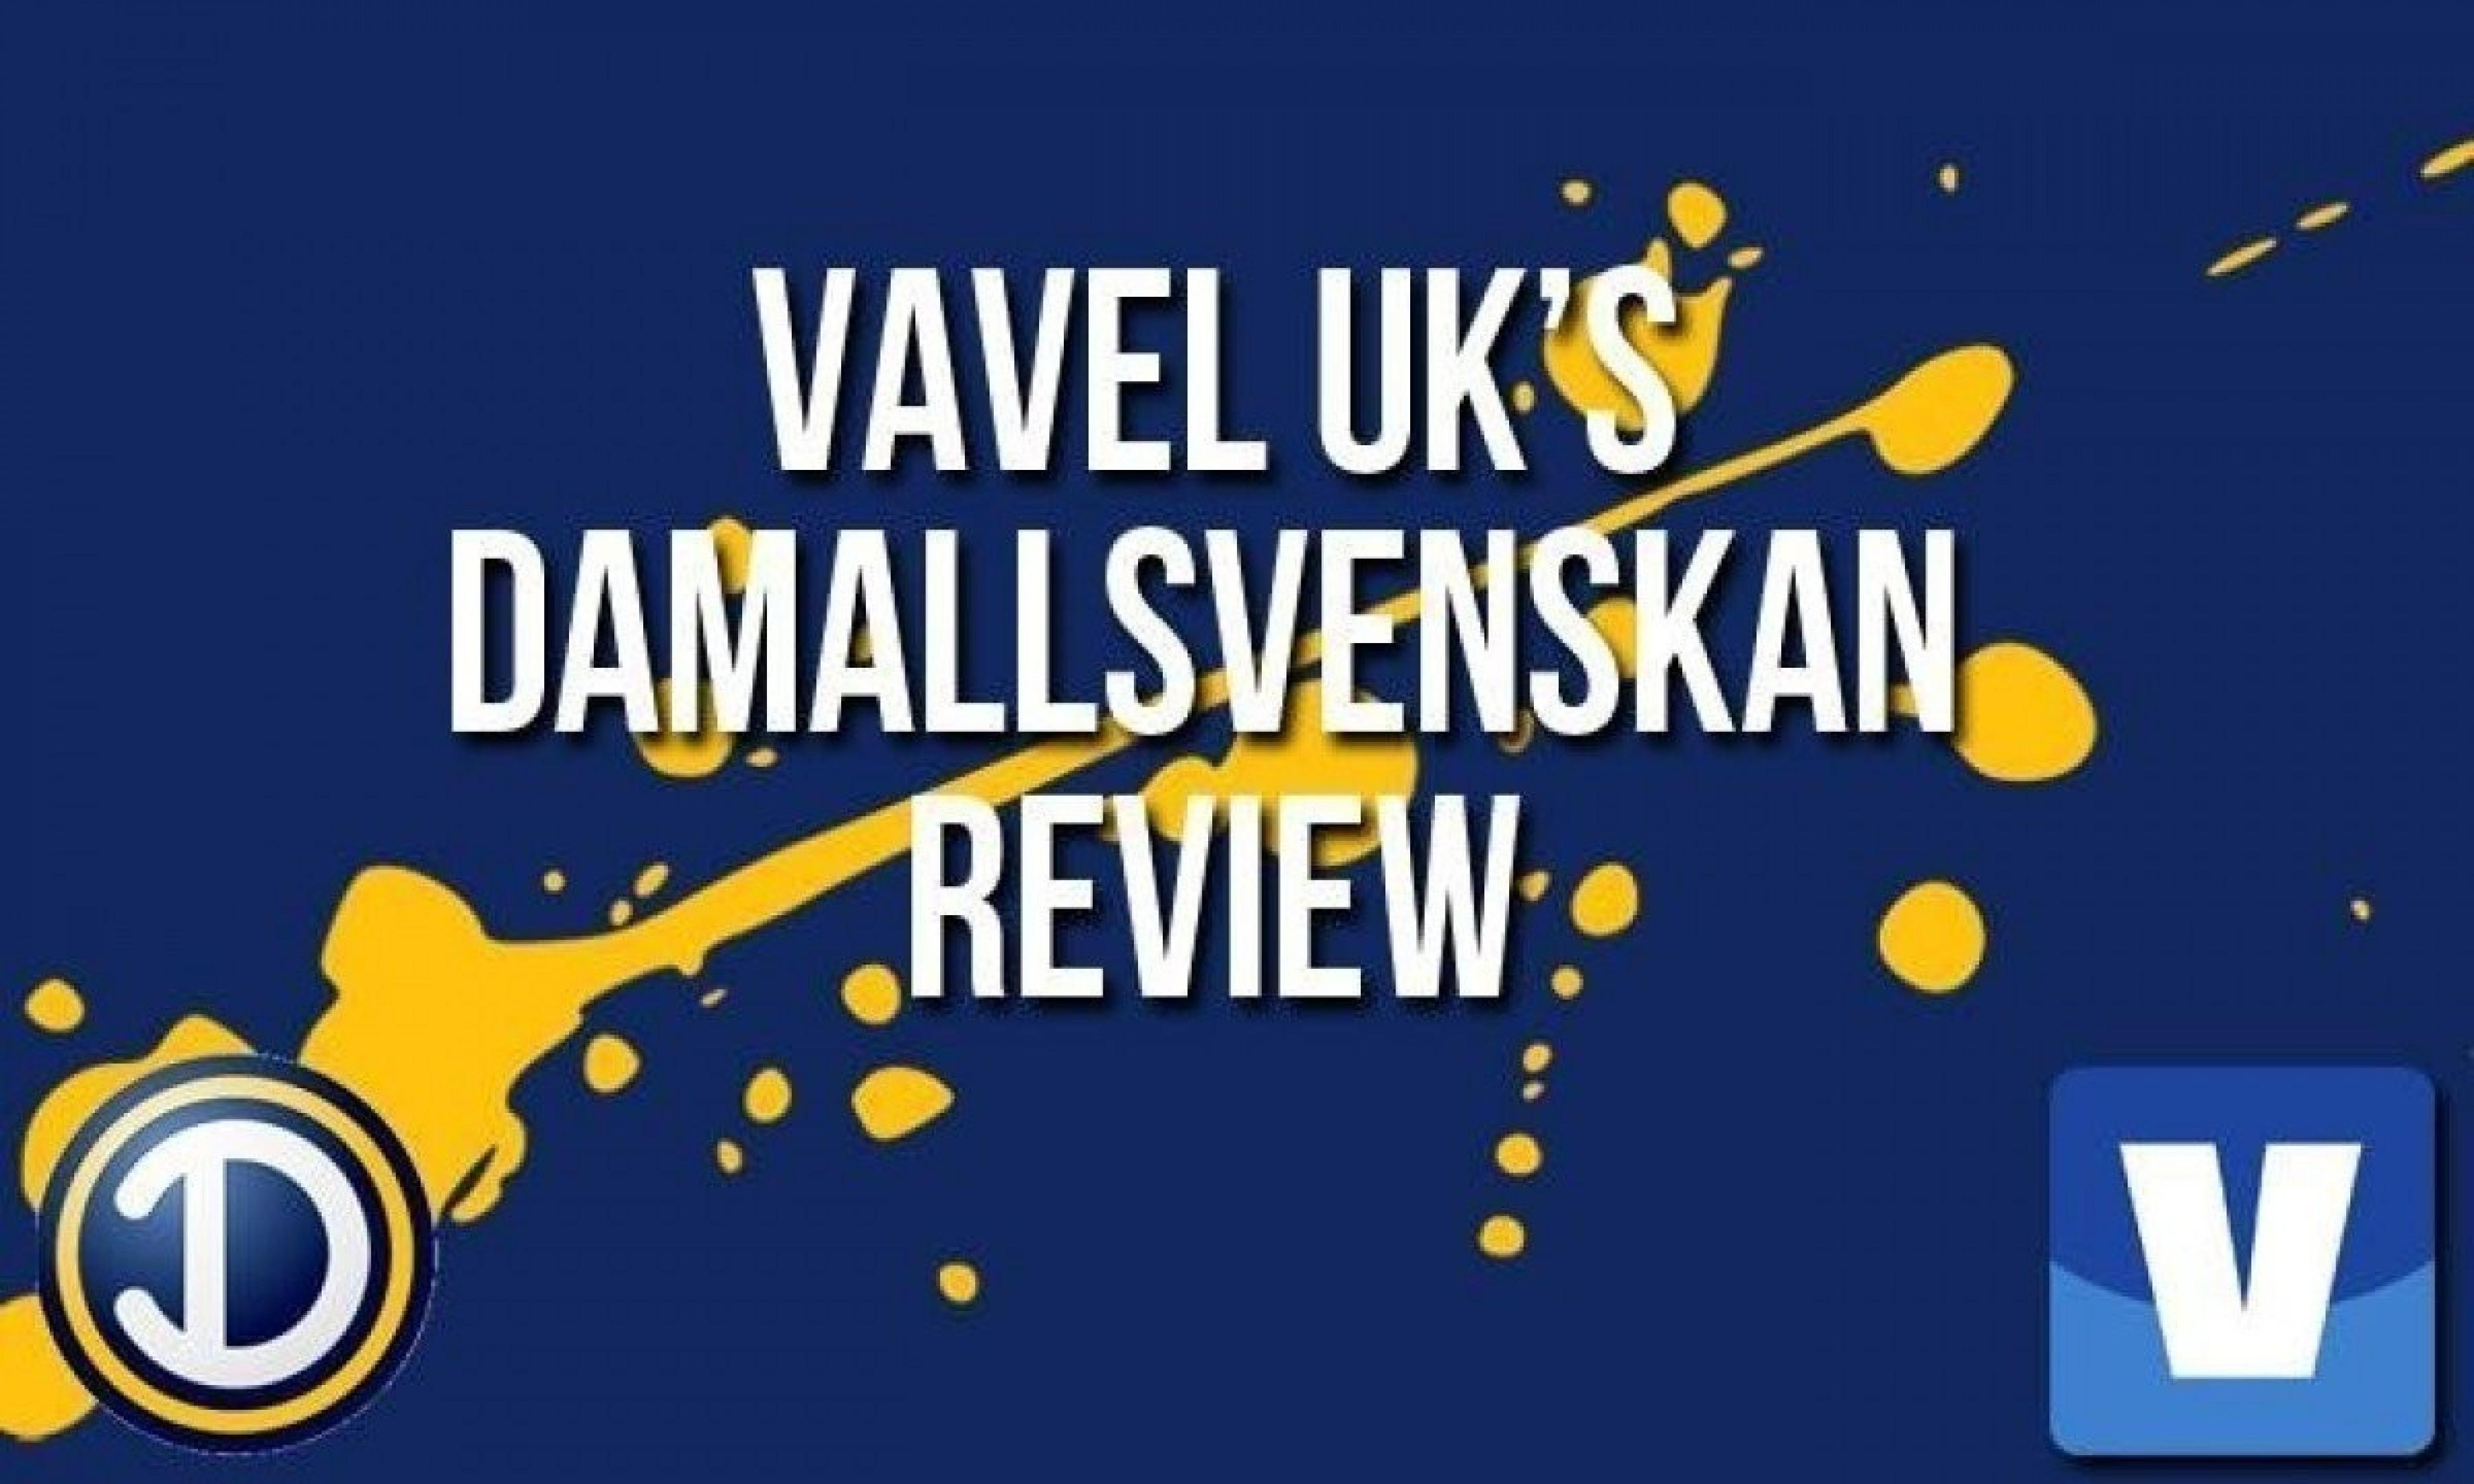 Damallsvenskan week 17 review: Piteå back on top after a goal-heavy weekend